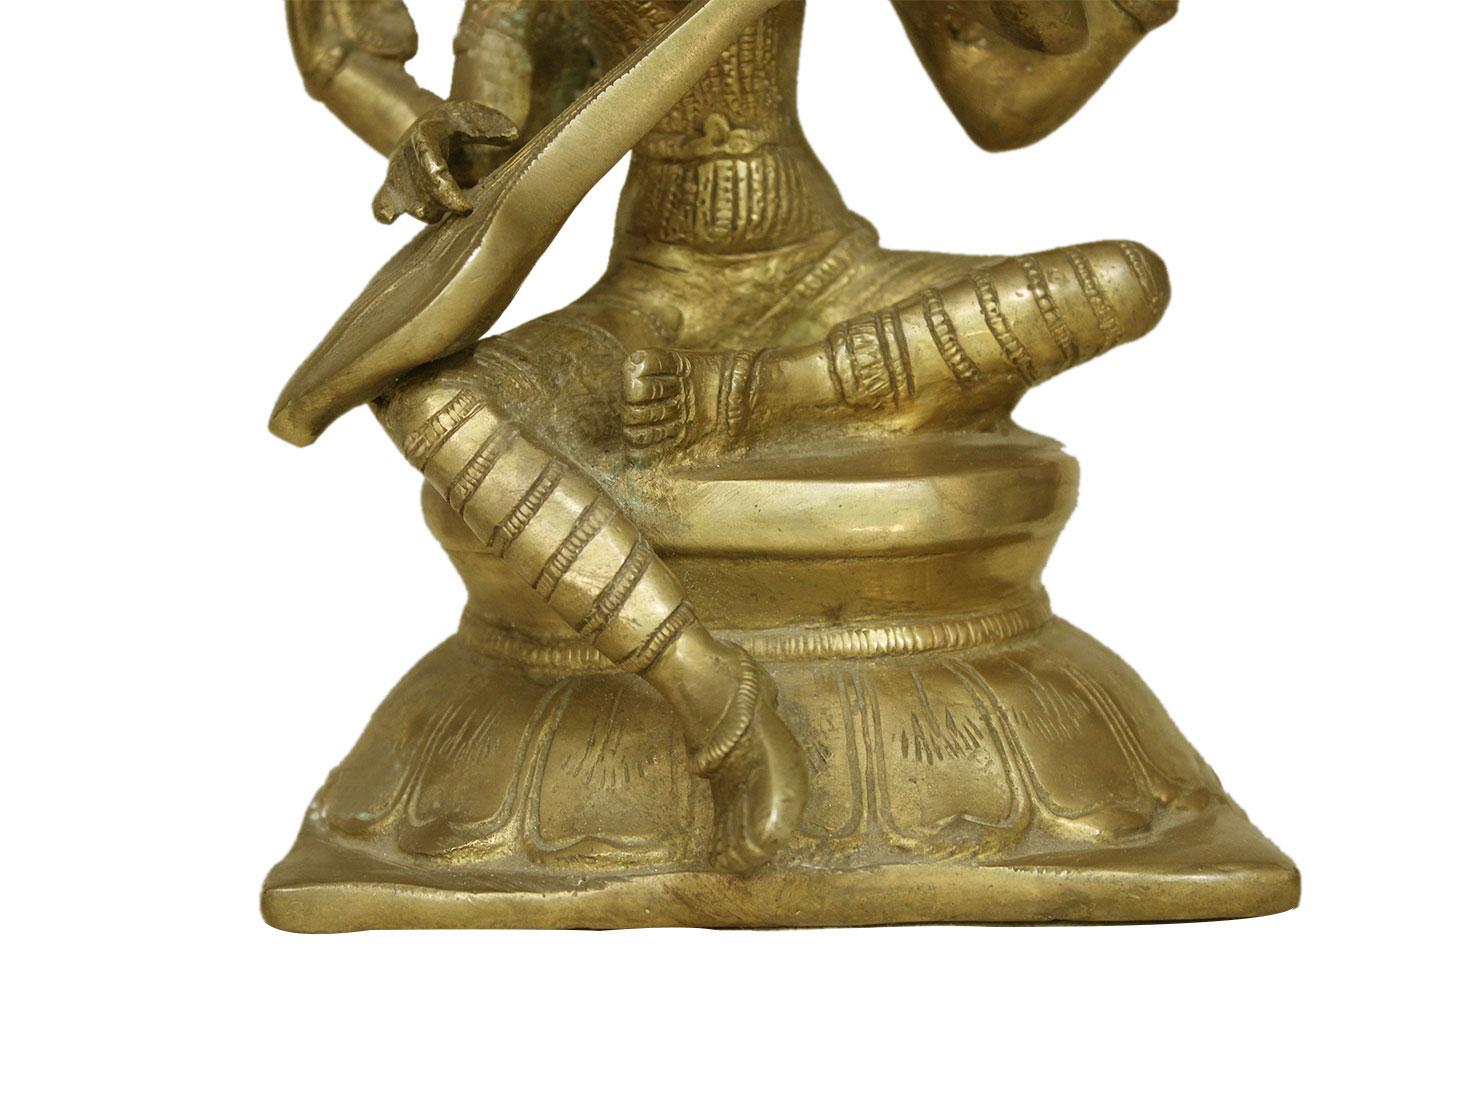 Brass Saraswati (Ht-7.9 Inches)